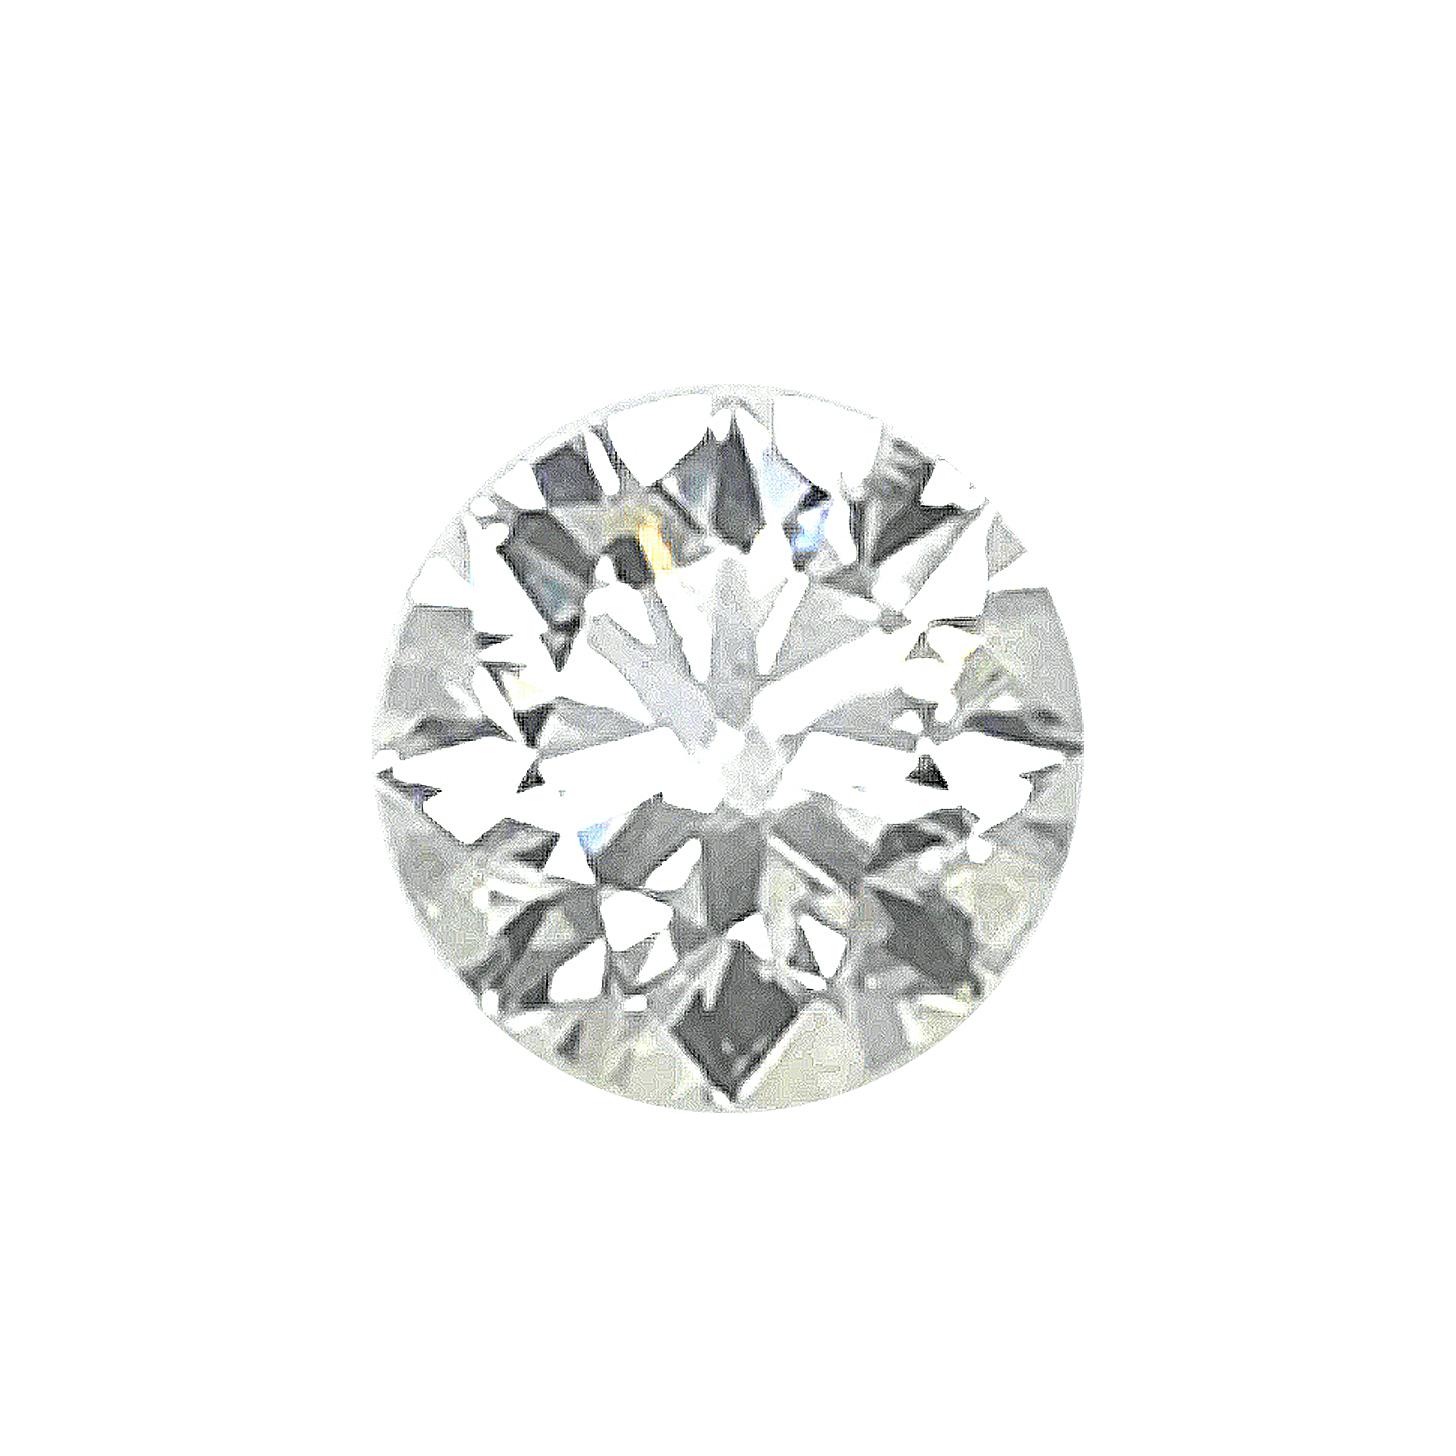 Diamant im Brillantschliff, 0,91 ct, inkl. DPL-Expertise – Sammler Edelstein